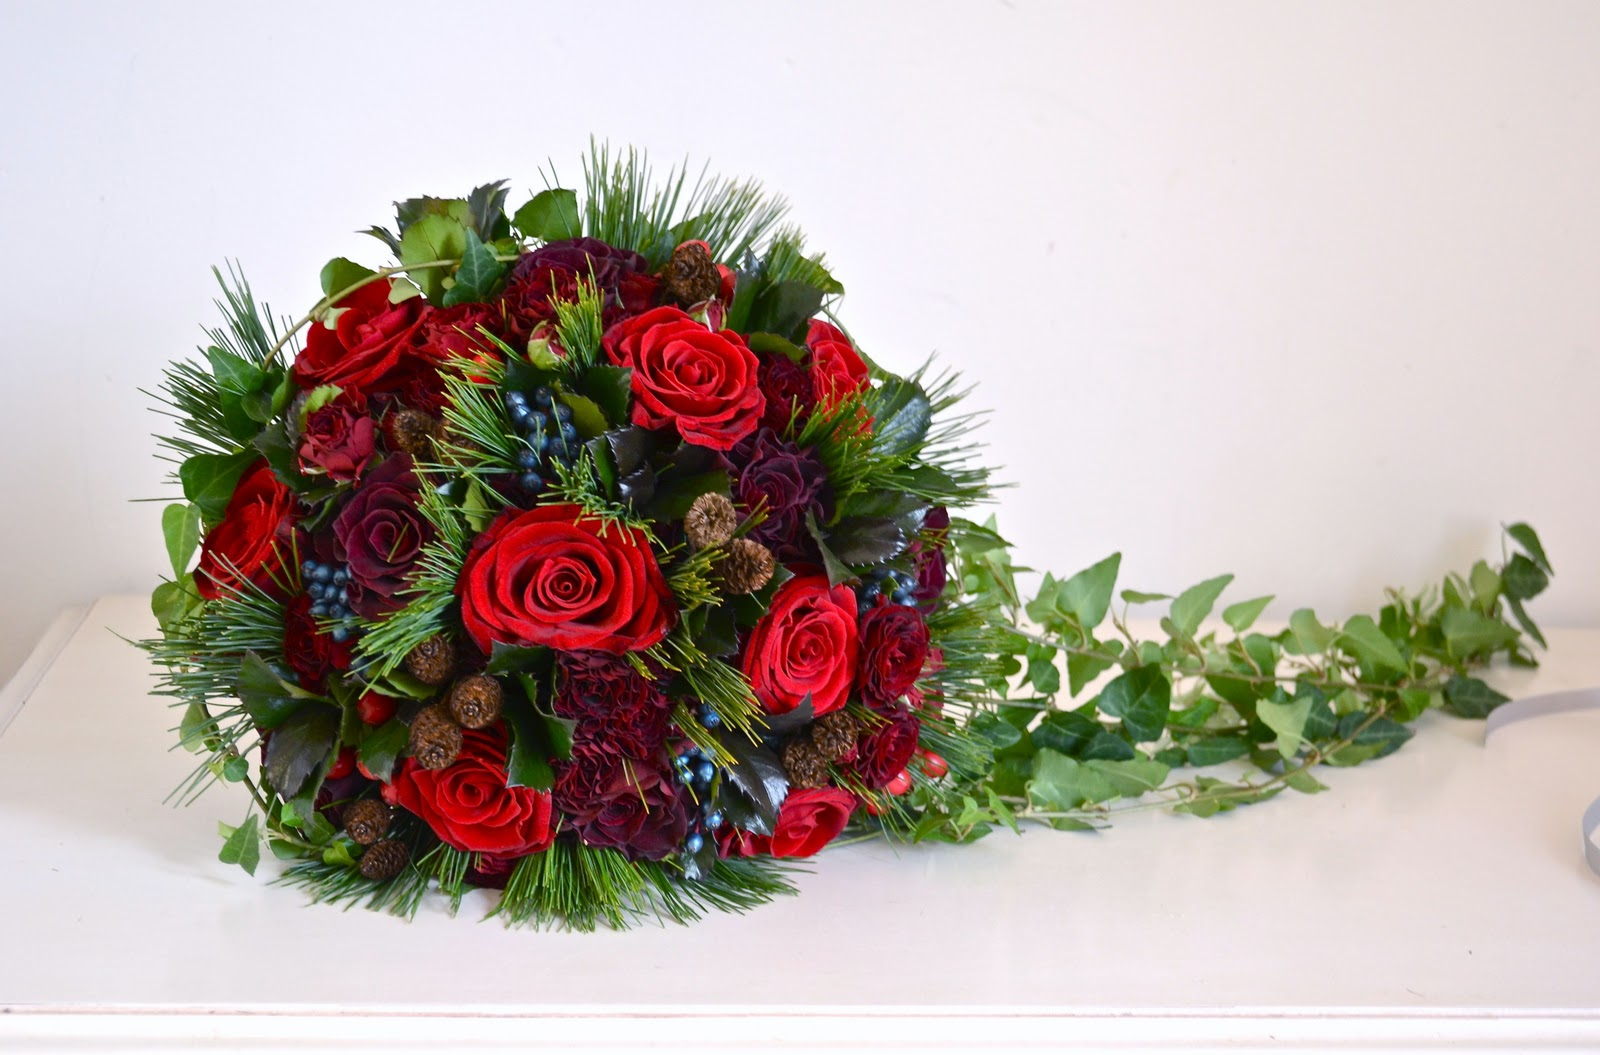 Wedding Flowers Blog Jemma s Christmas Wedding Flowers Solent Spa